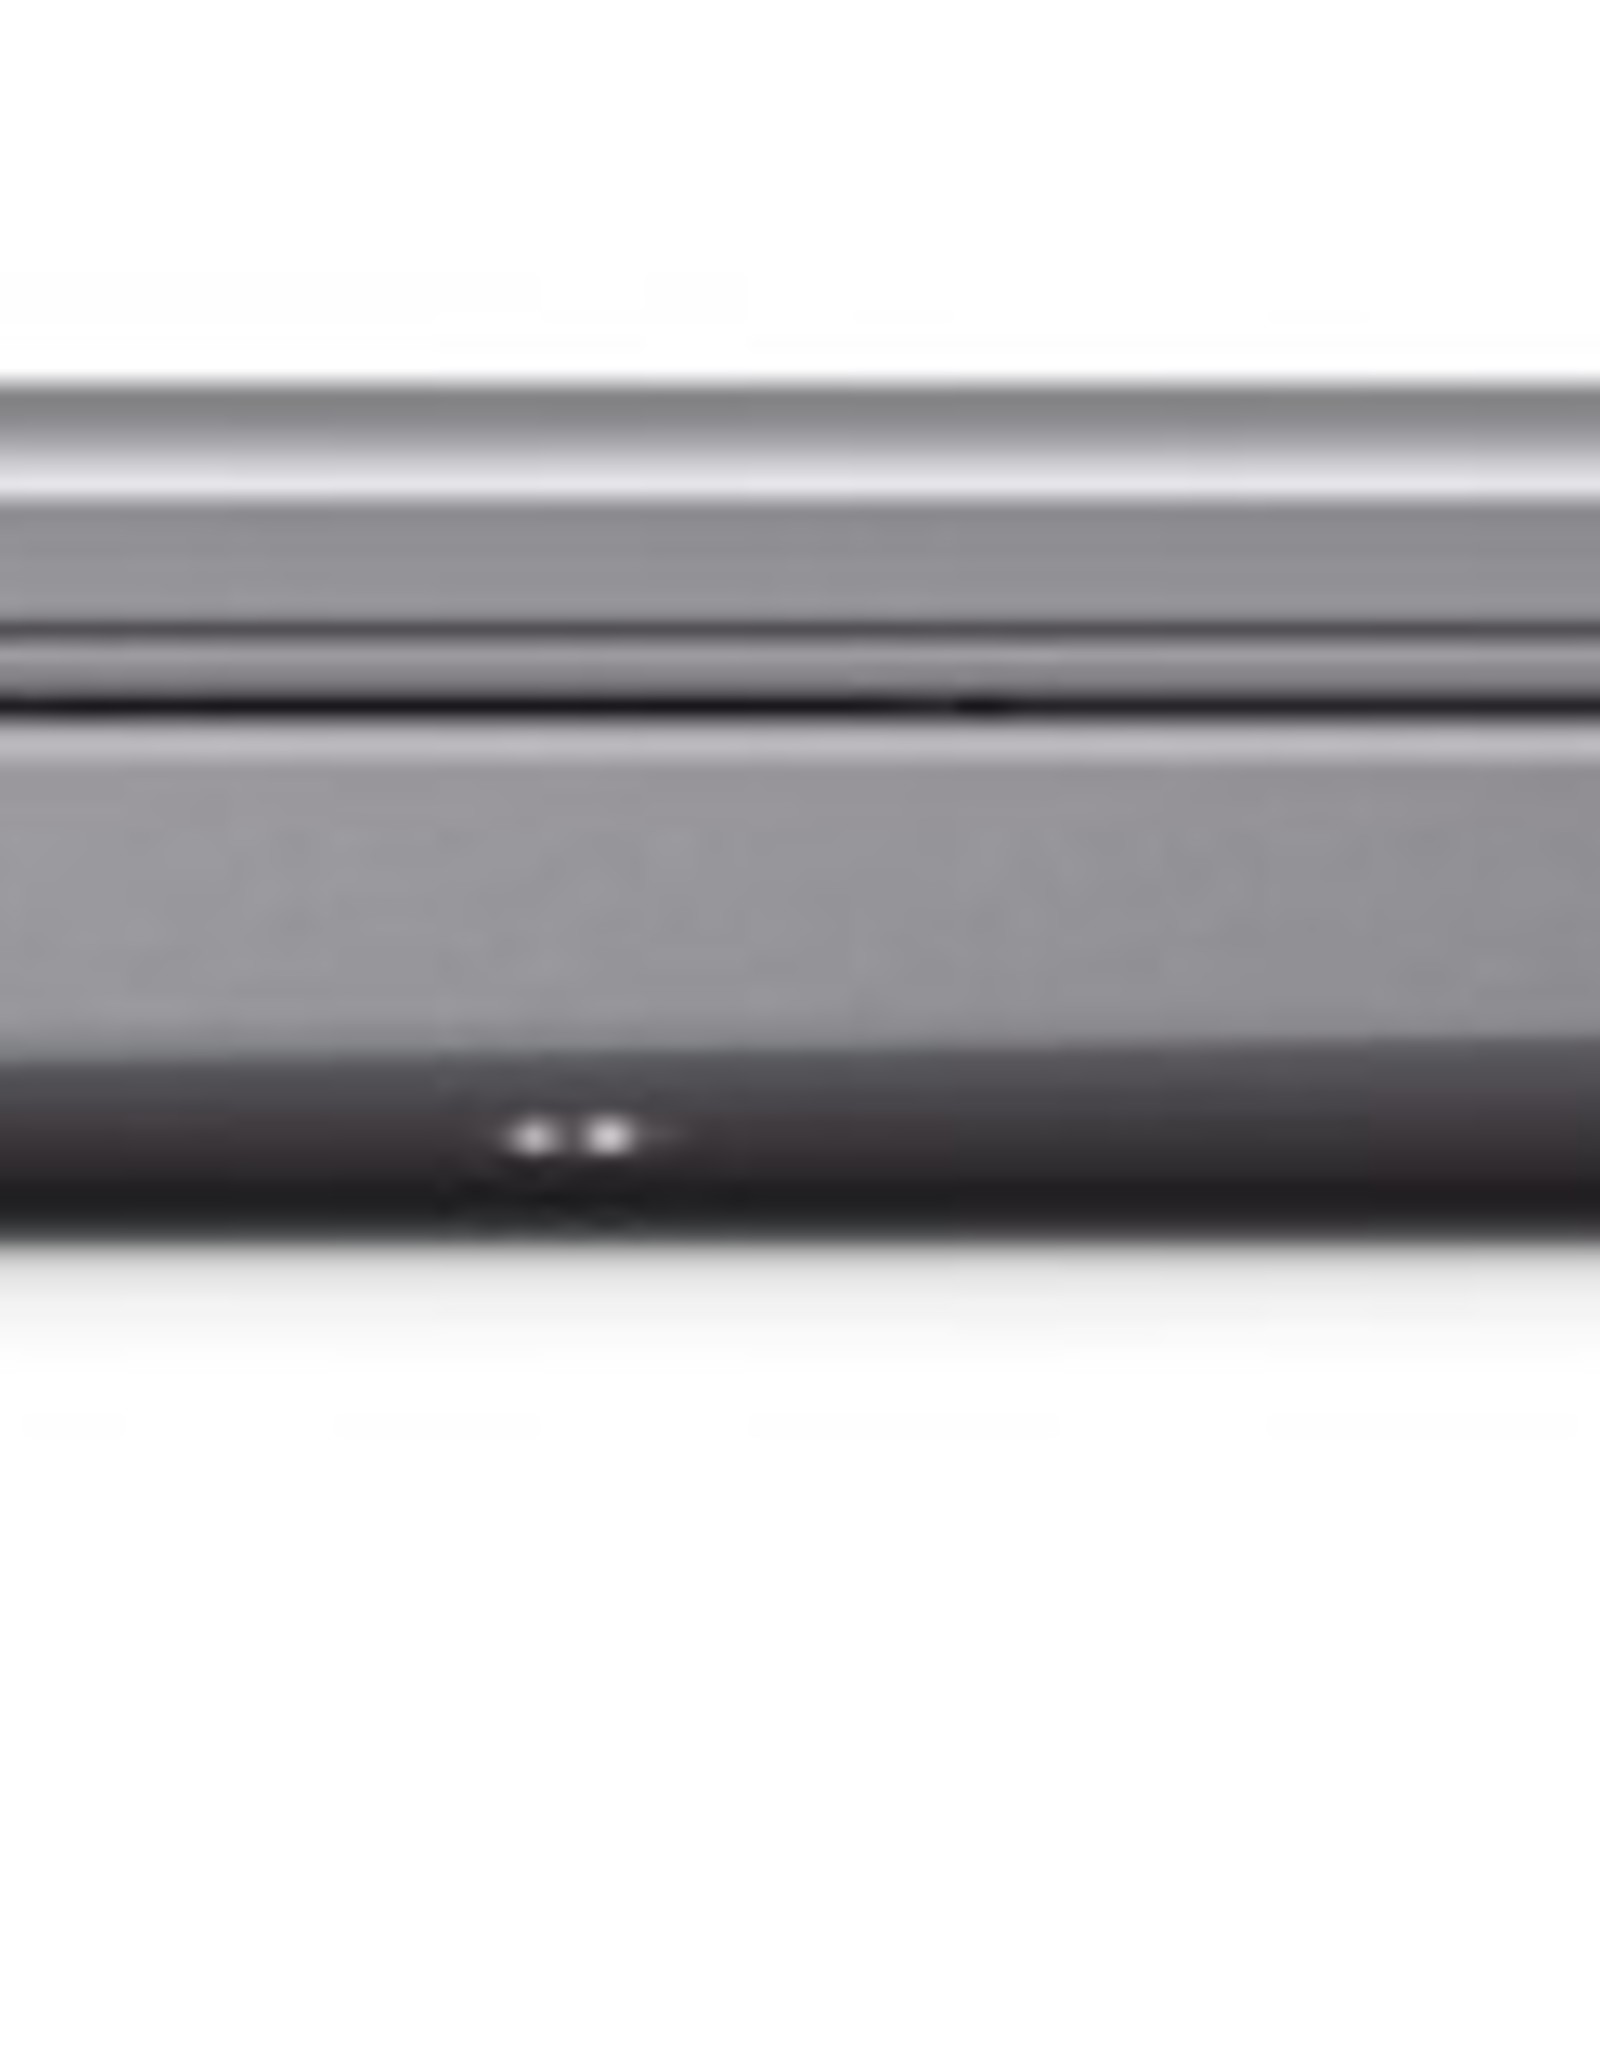 14.0 F-HD IPS TOUCH i3-7020U / 8GB / 256GB / W10H